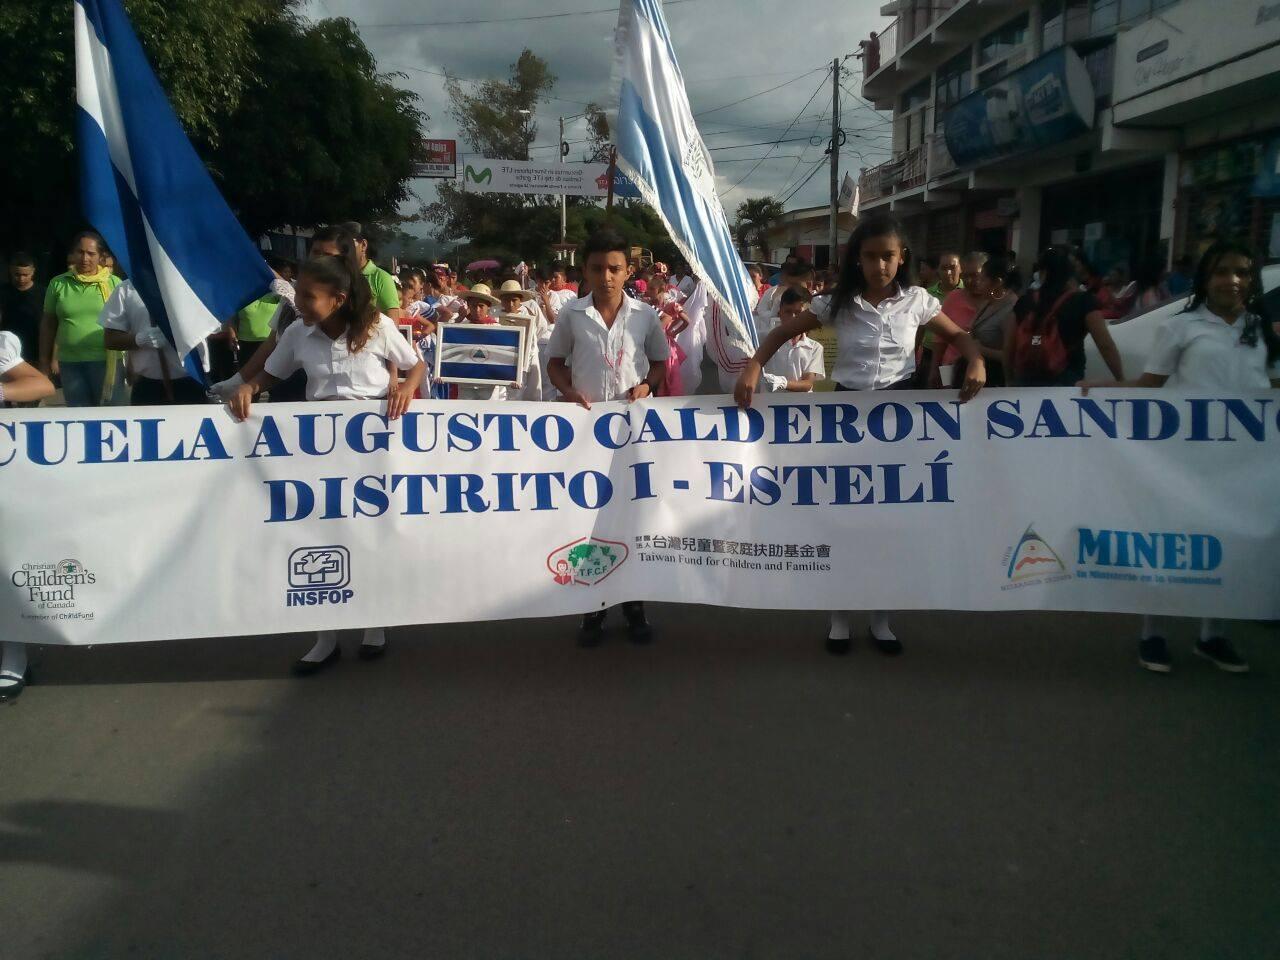 desfileEsteli